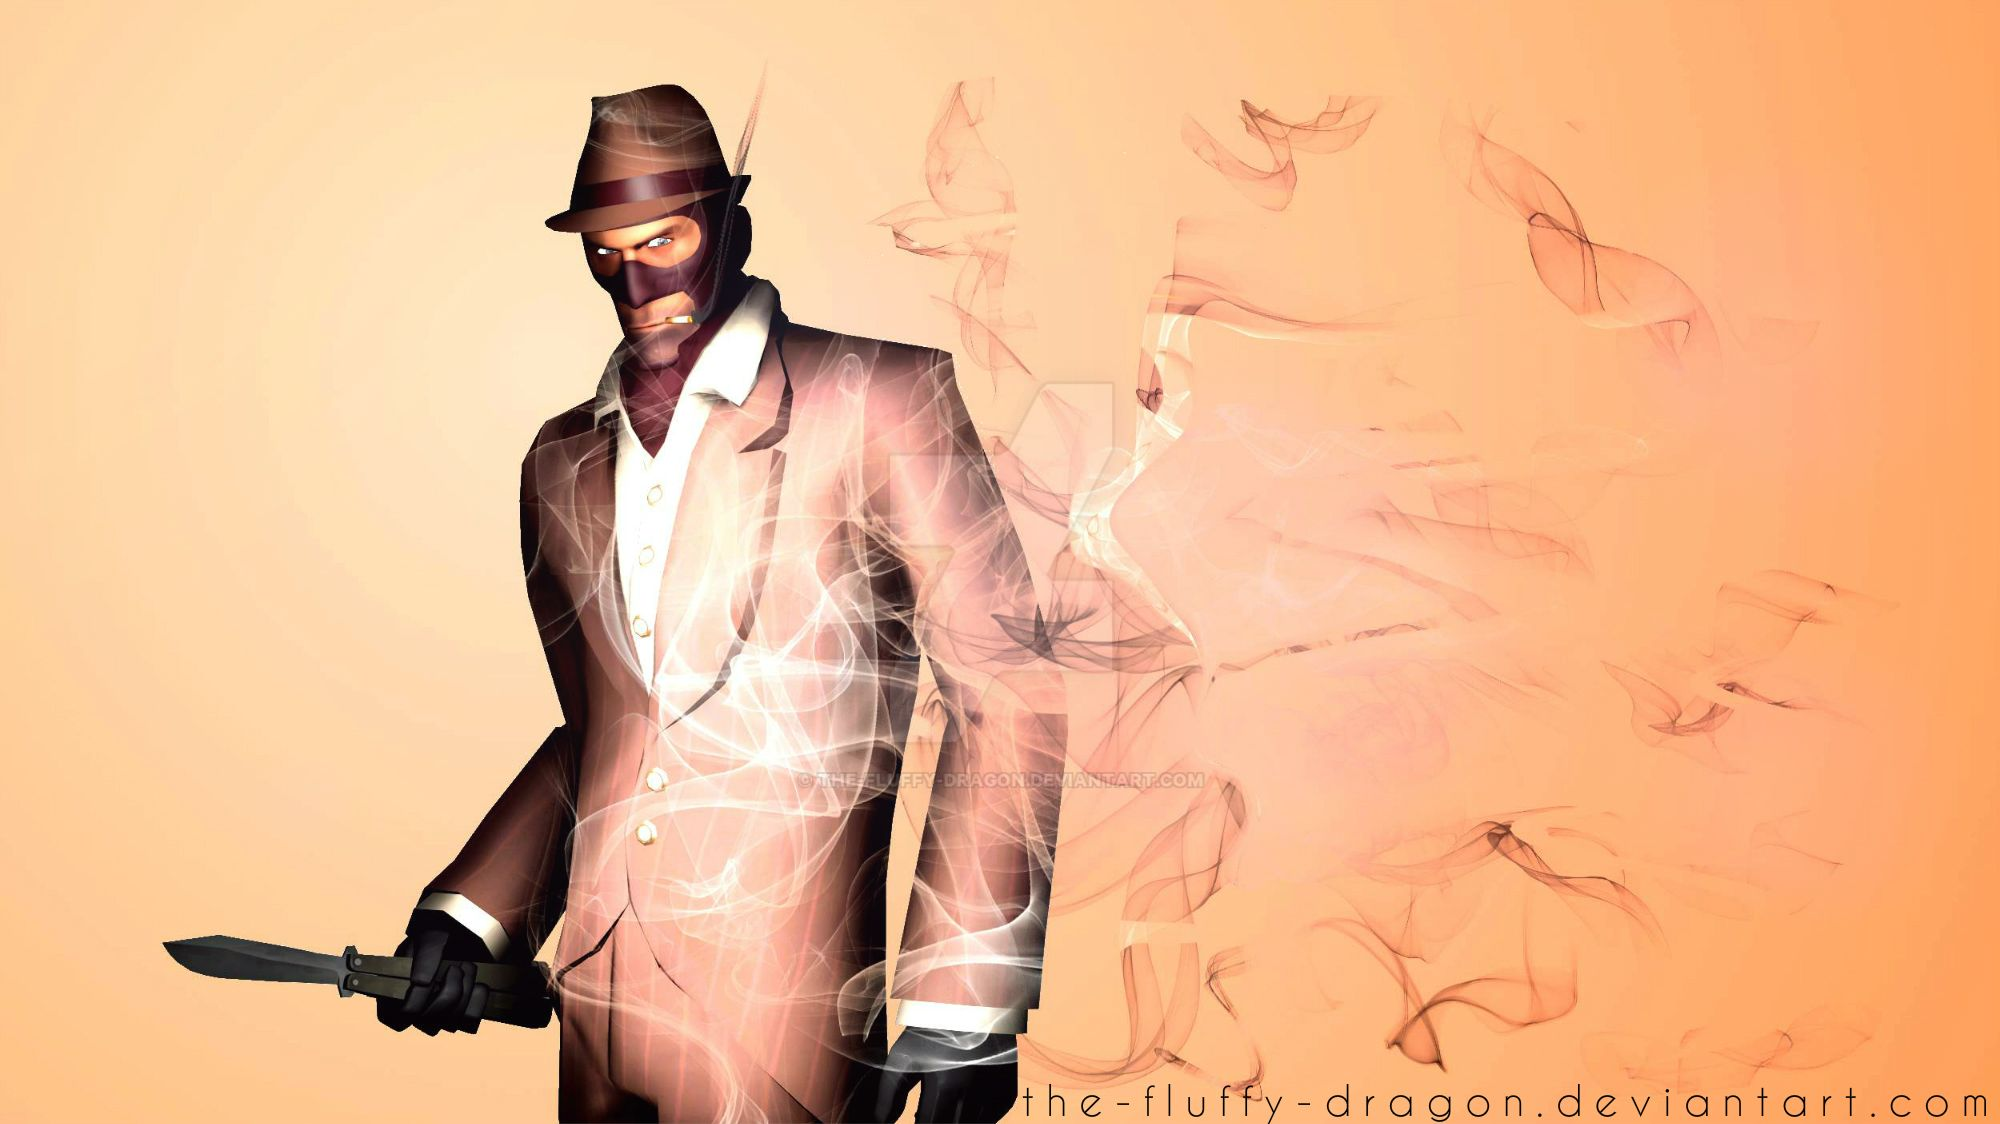 Tf2 spy wallpaper sfm